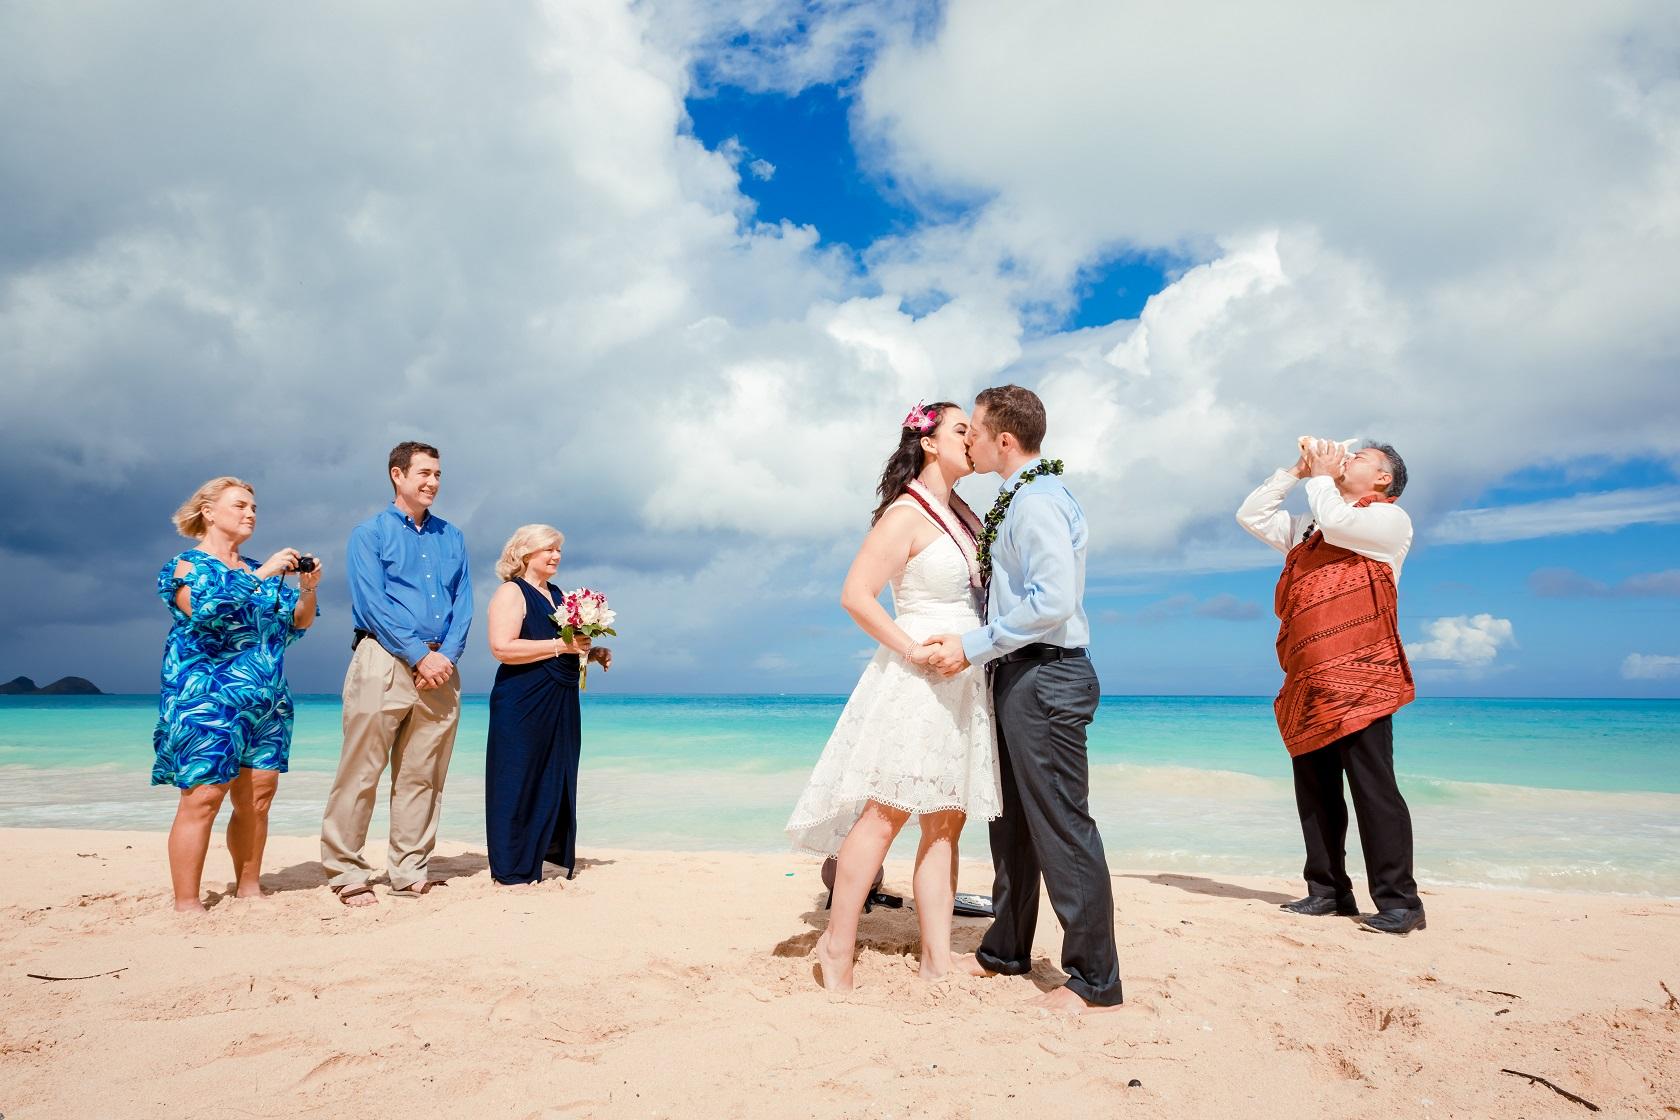 oahu hawaii beach wedding elopement bride groom kiss